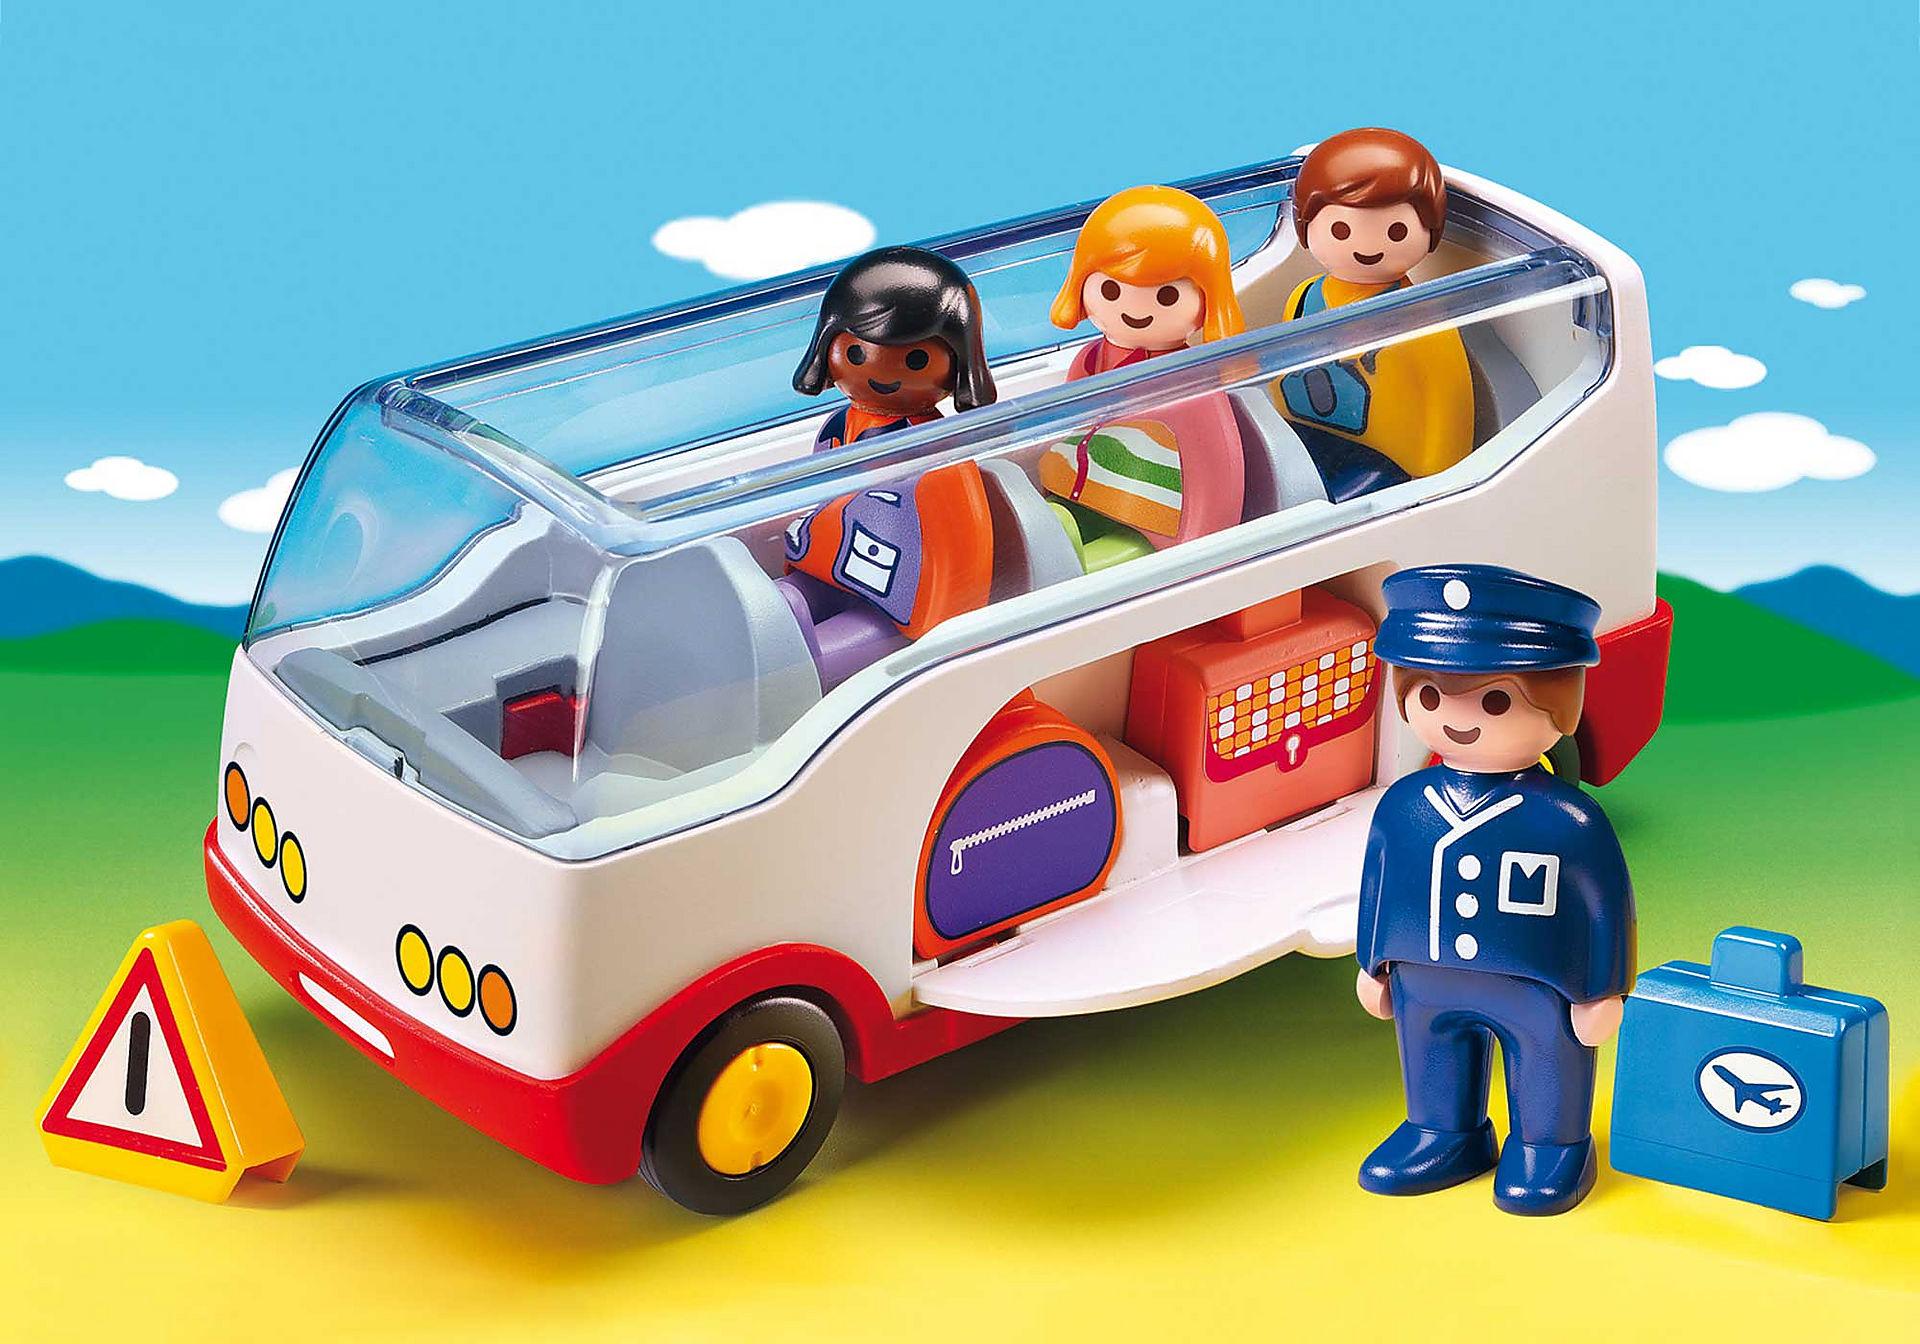 http://media.playmobil.com/i/playmobil/6773_product_detail/Autocar de voyage